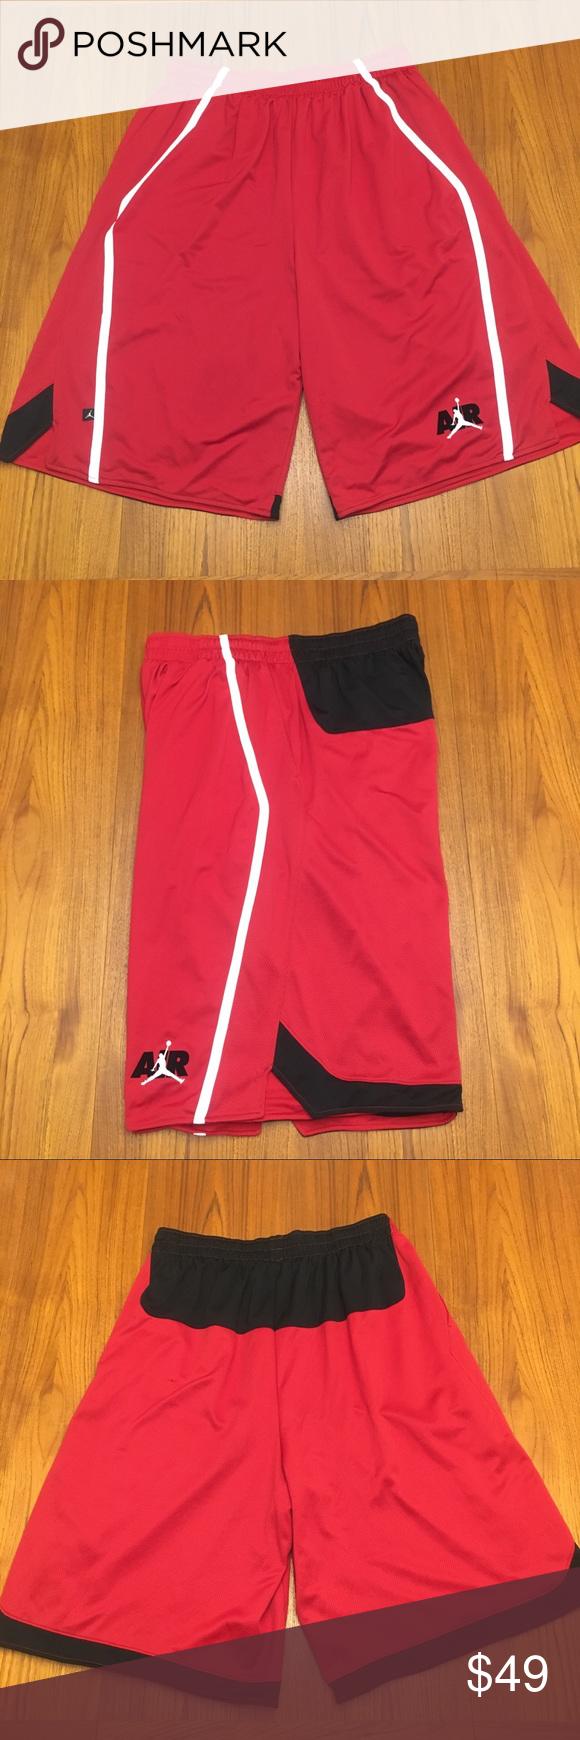 Sold Vintage Nike Air Jordan Shorts Xxlt 2007 In 2020 Vintage Nike Jordan Shorts Nike Air Jordan